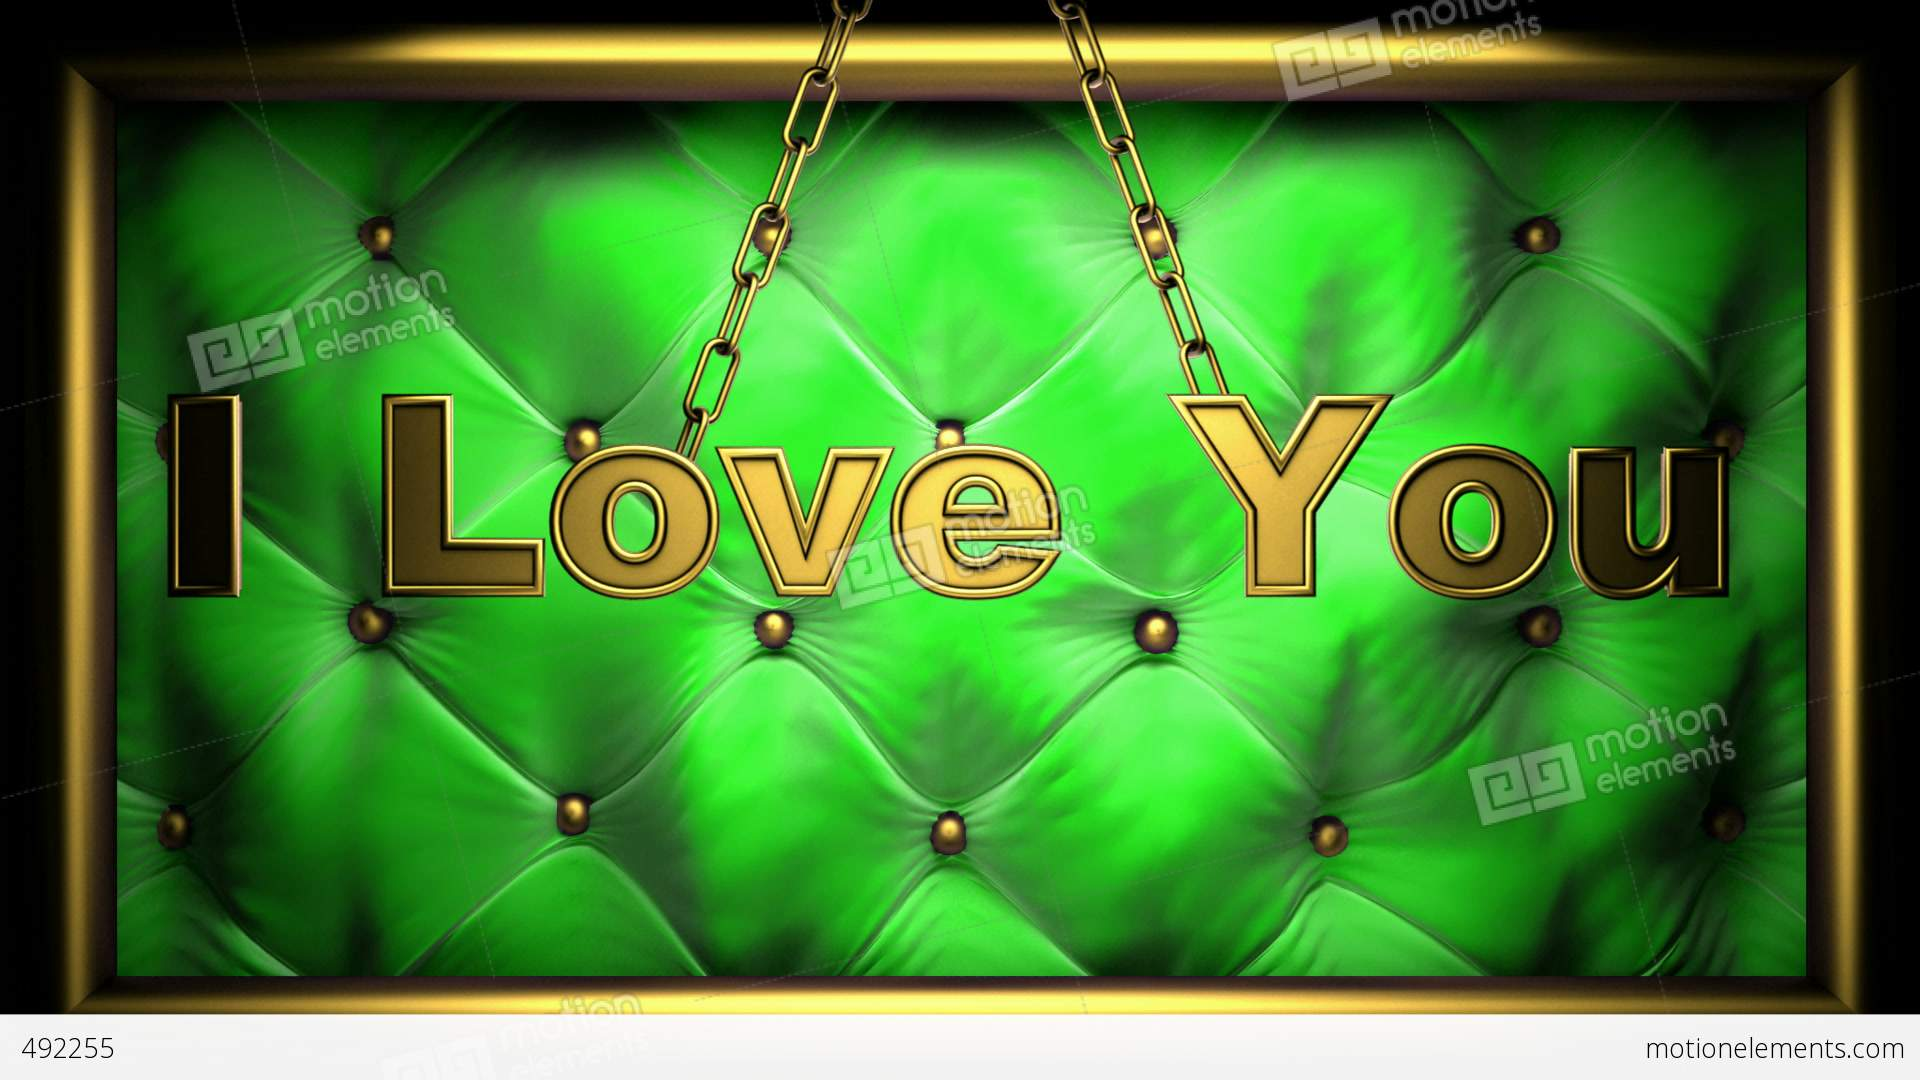 I Love You Imágenes De Stock I Love You Fotos De Stock: I Love You Green Stock Animation